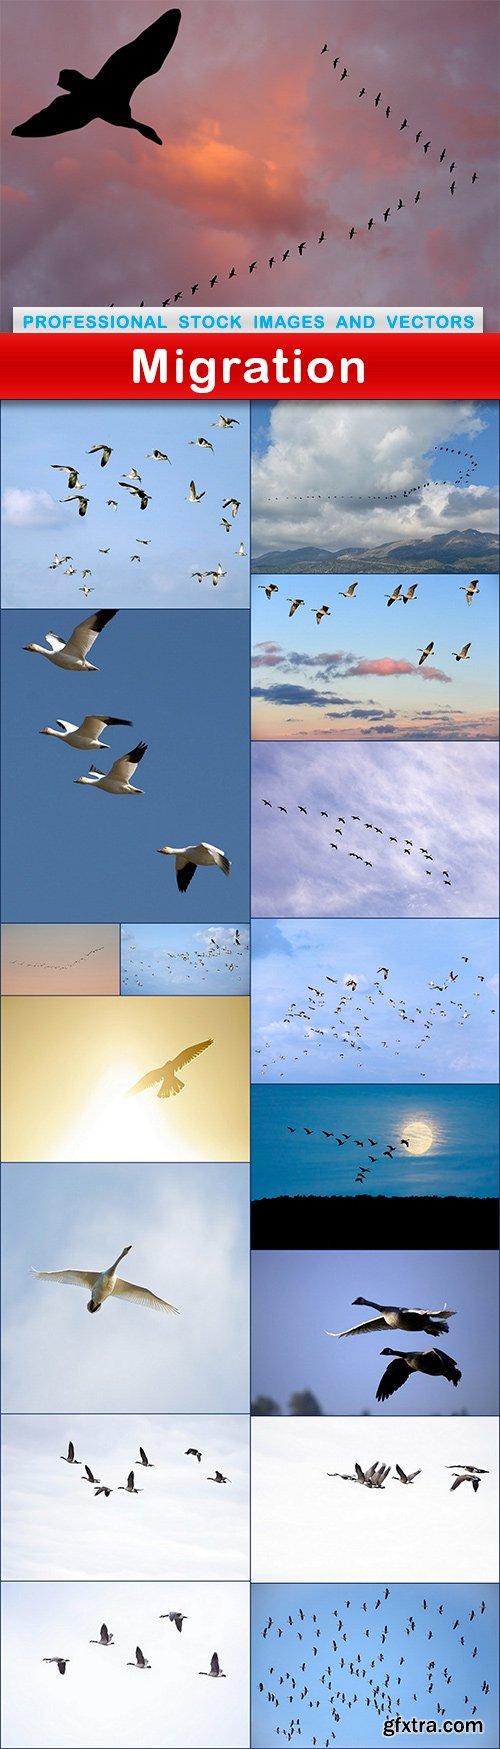 Migration - 17 UHQ JPEG